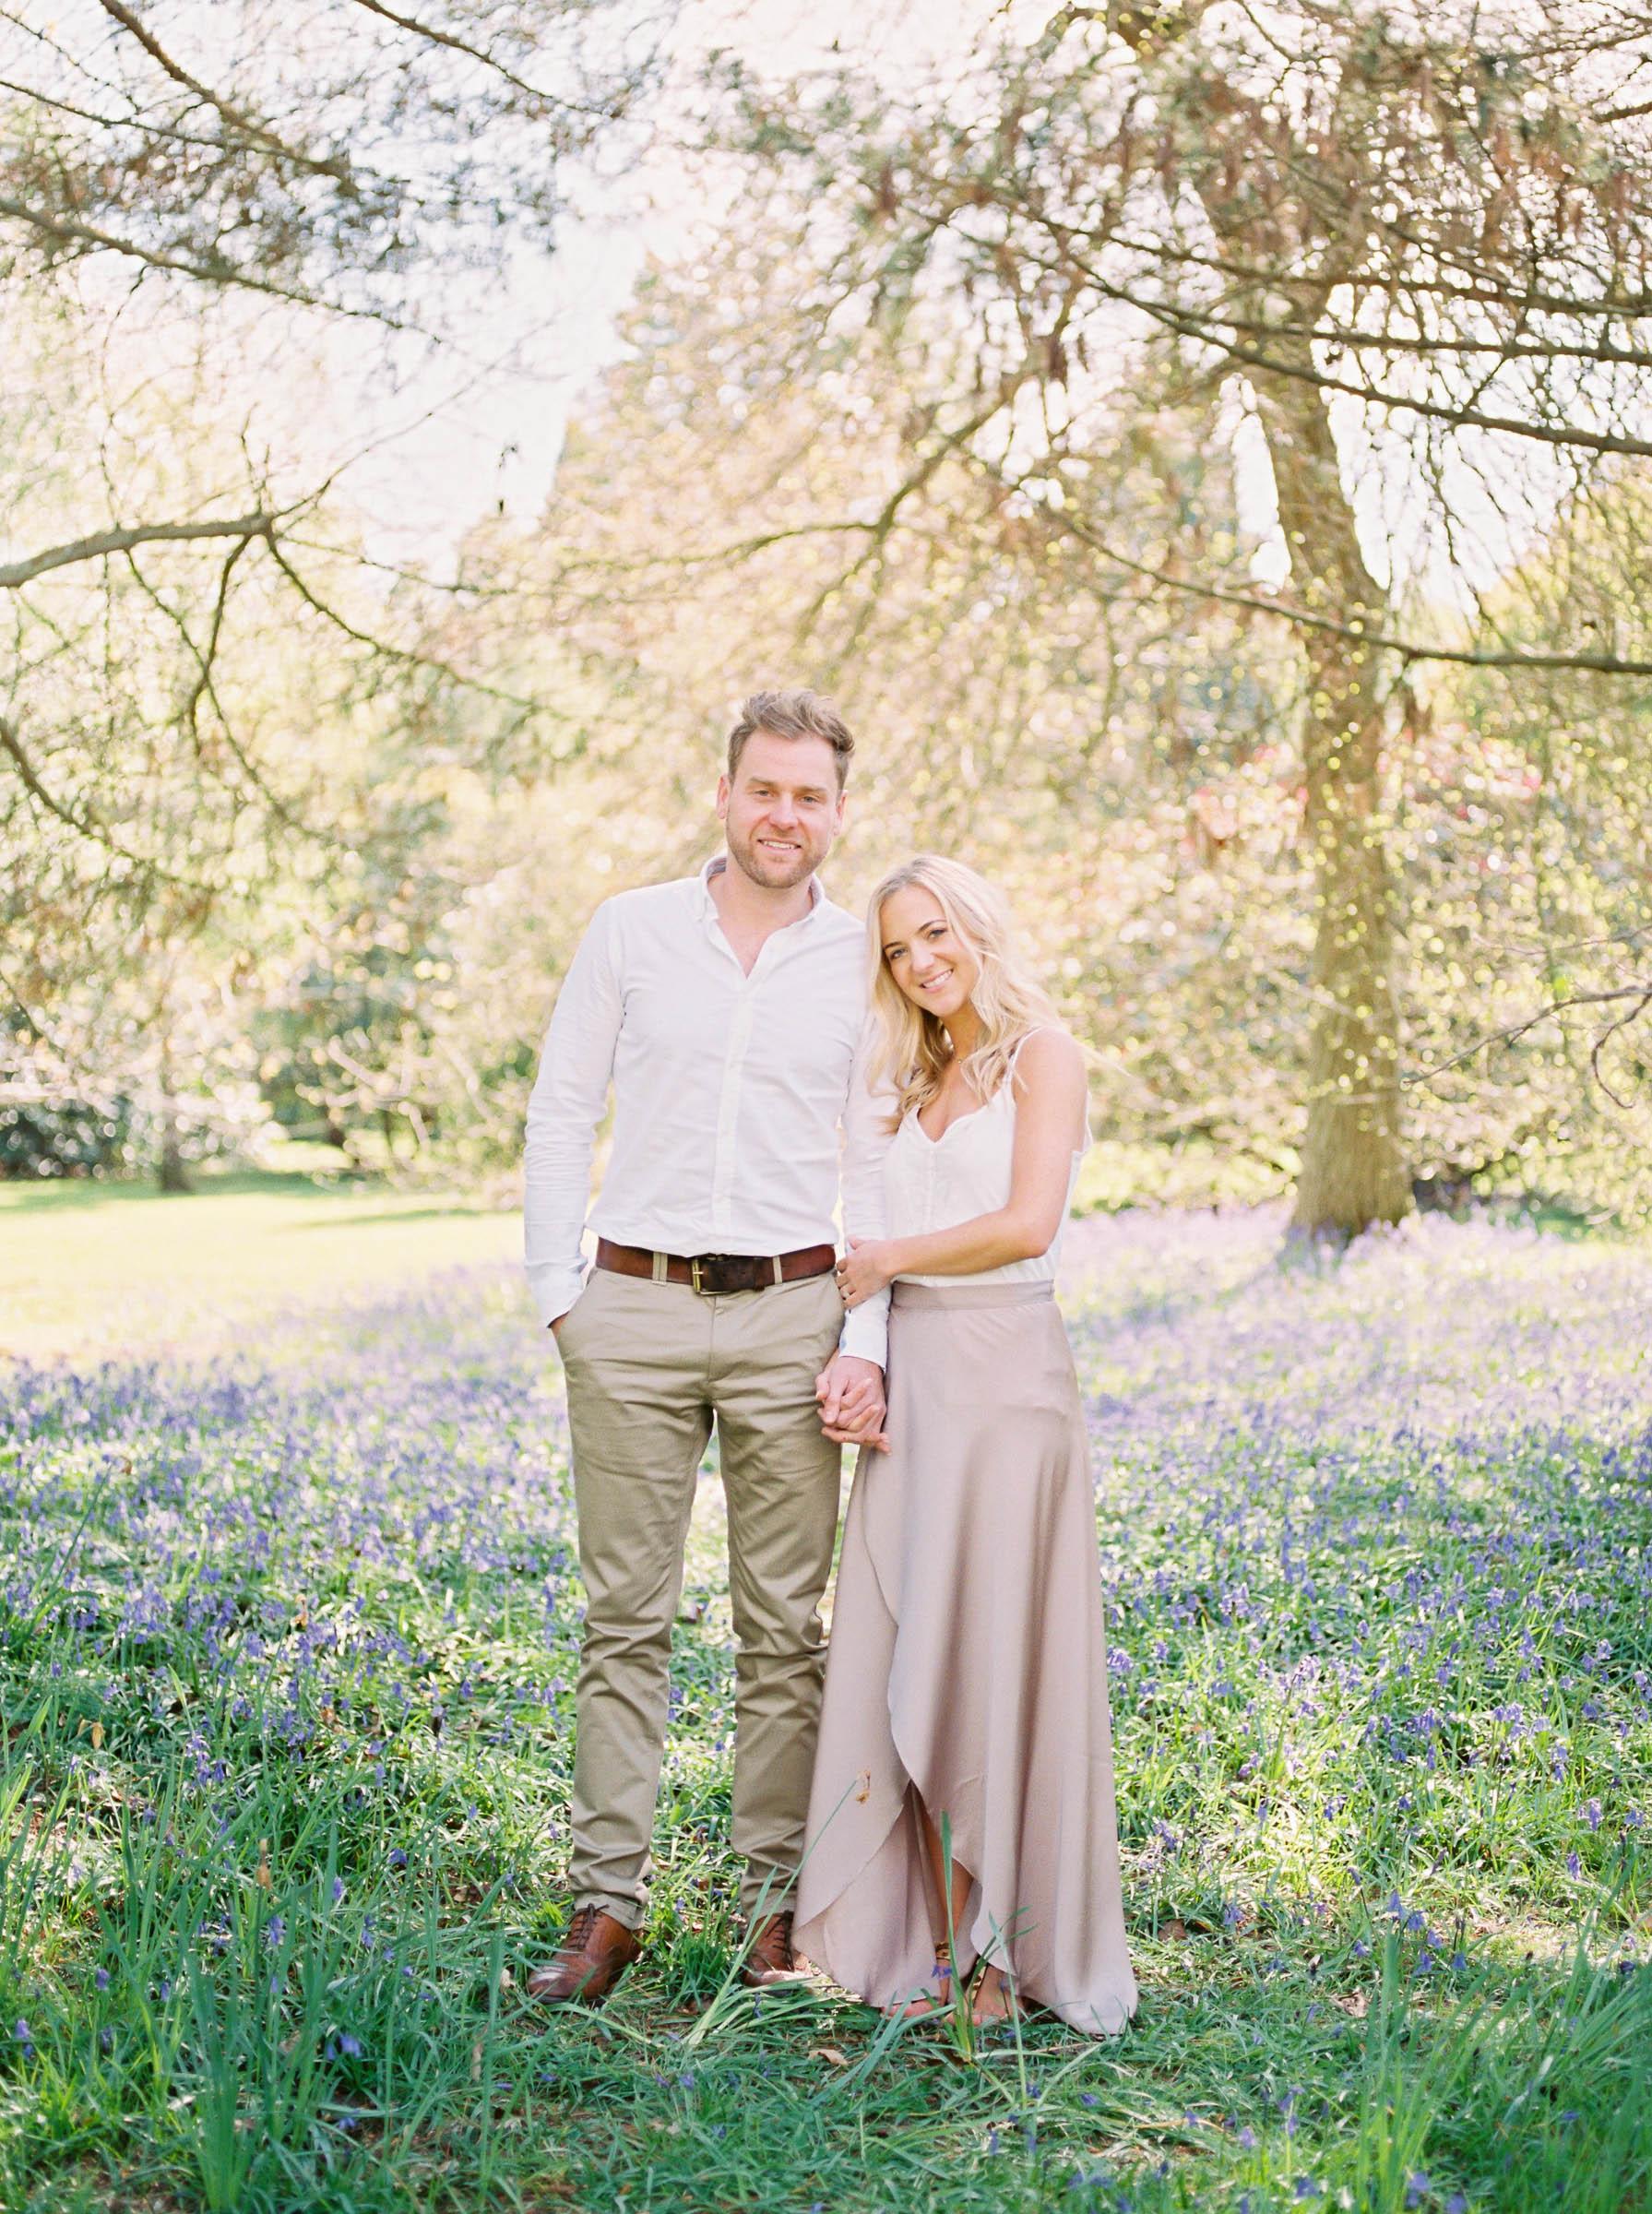 Amy O'Boyle Photography- Destination & UK Fine Art Film Wedding Photographer- Sheffield Park Garden National Trust Spring Engagement Shoot-14.jpg